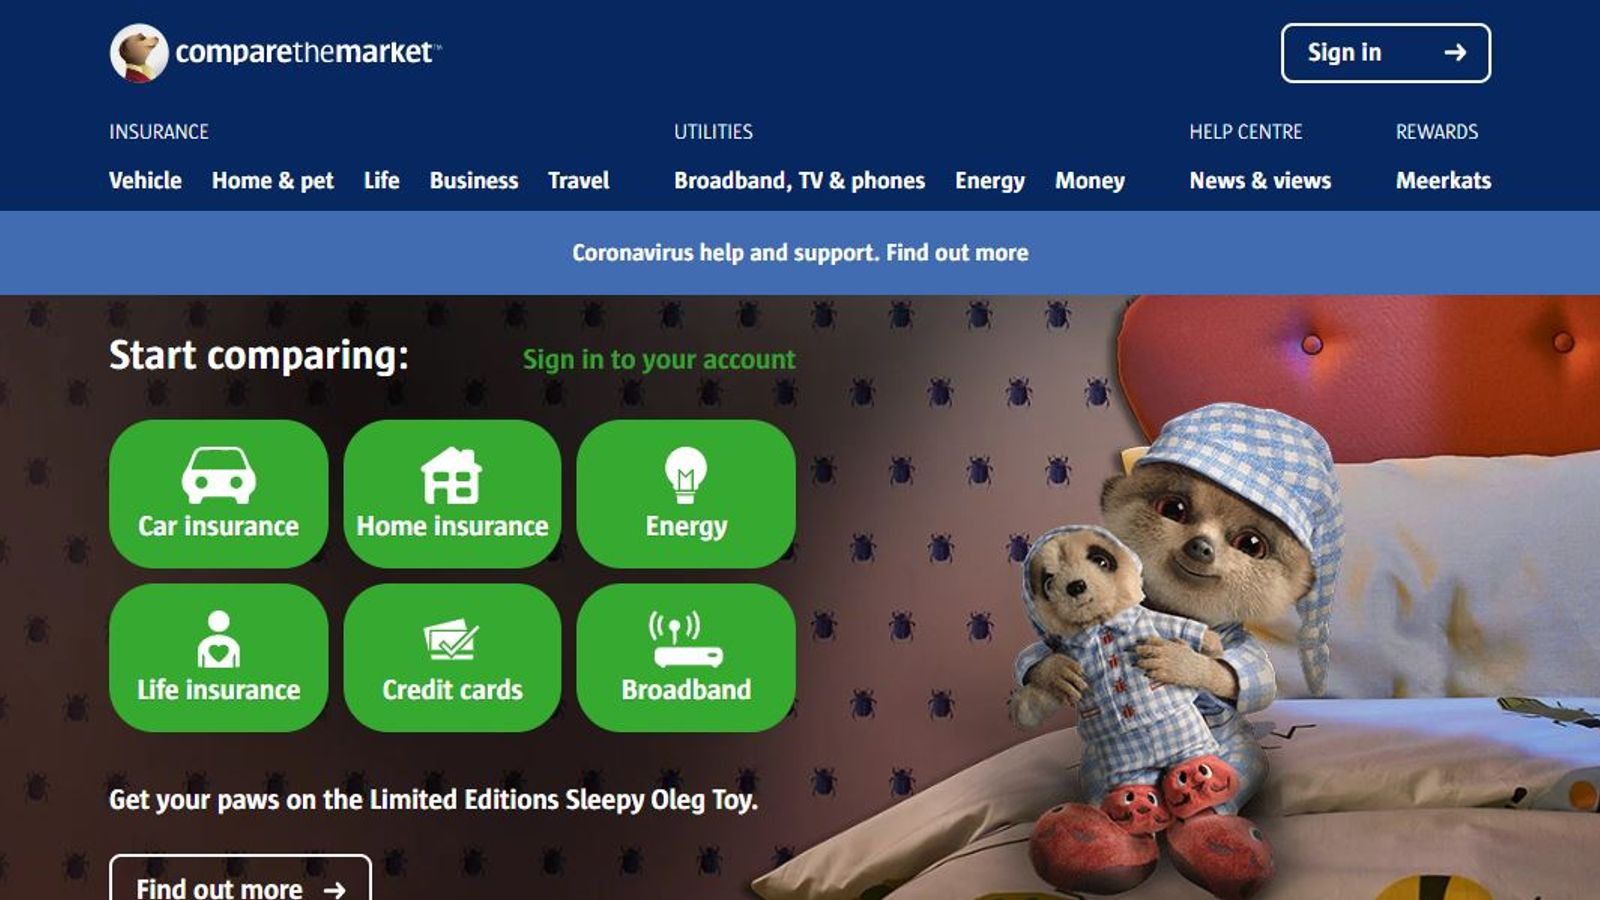 ComparetheMarket fined £17.9m for competition law breach